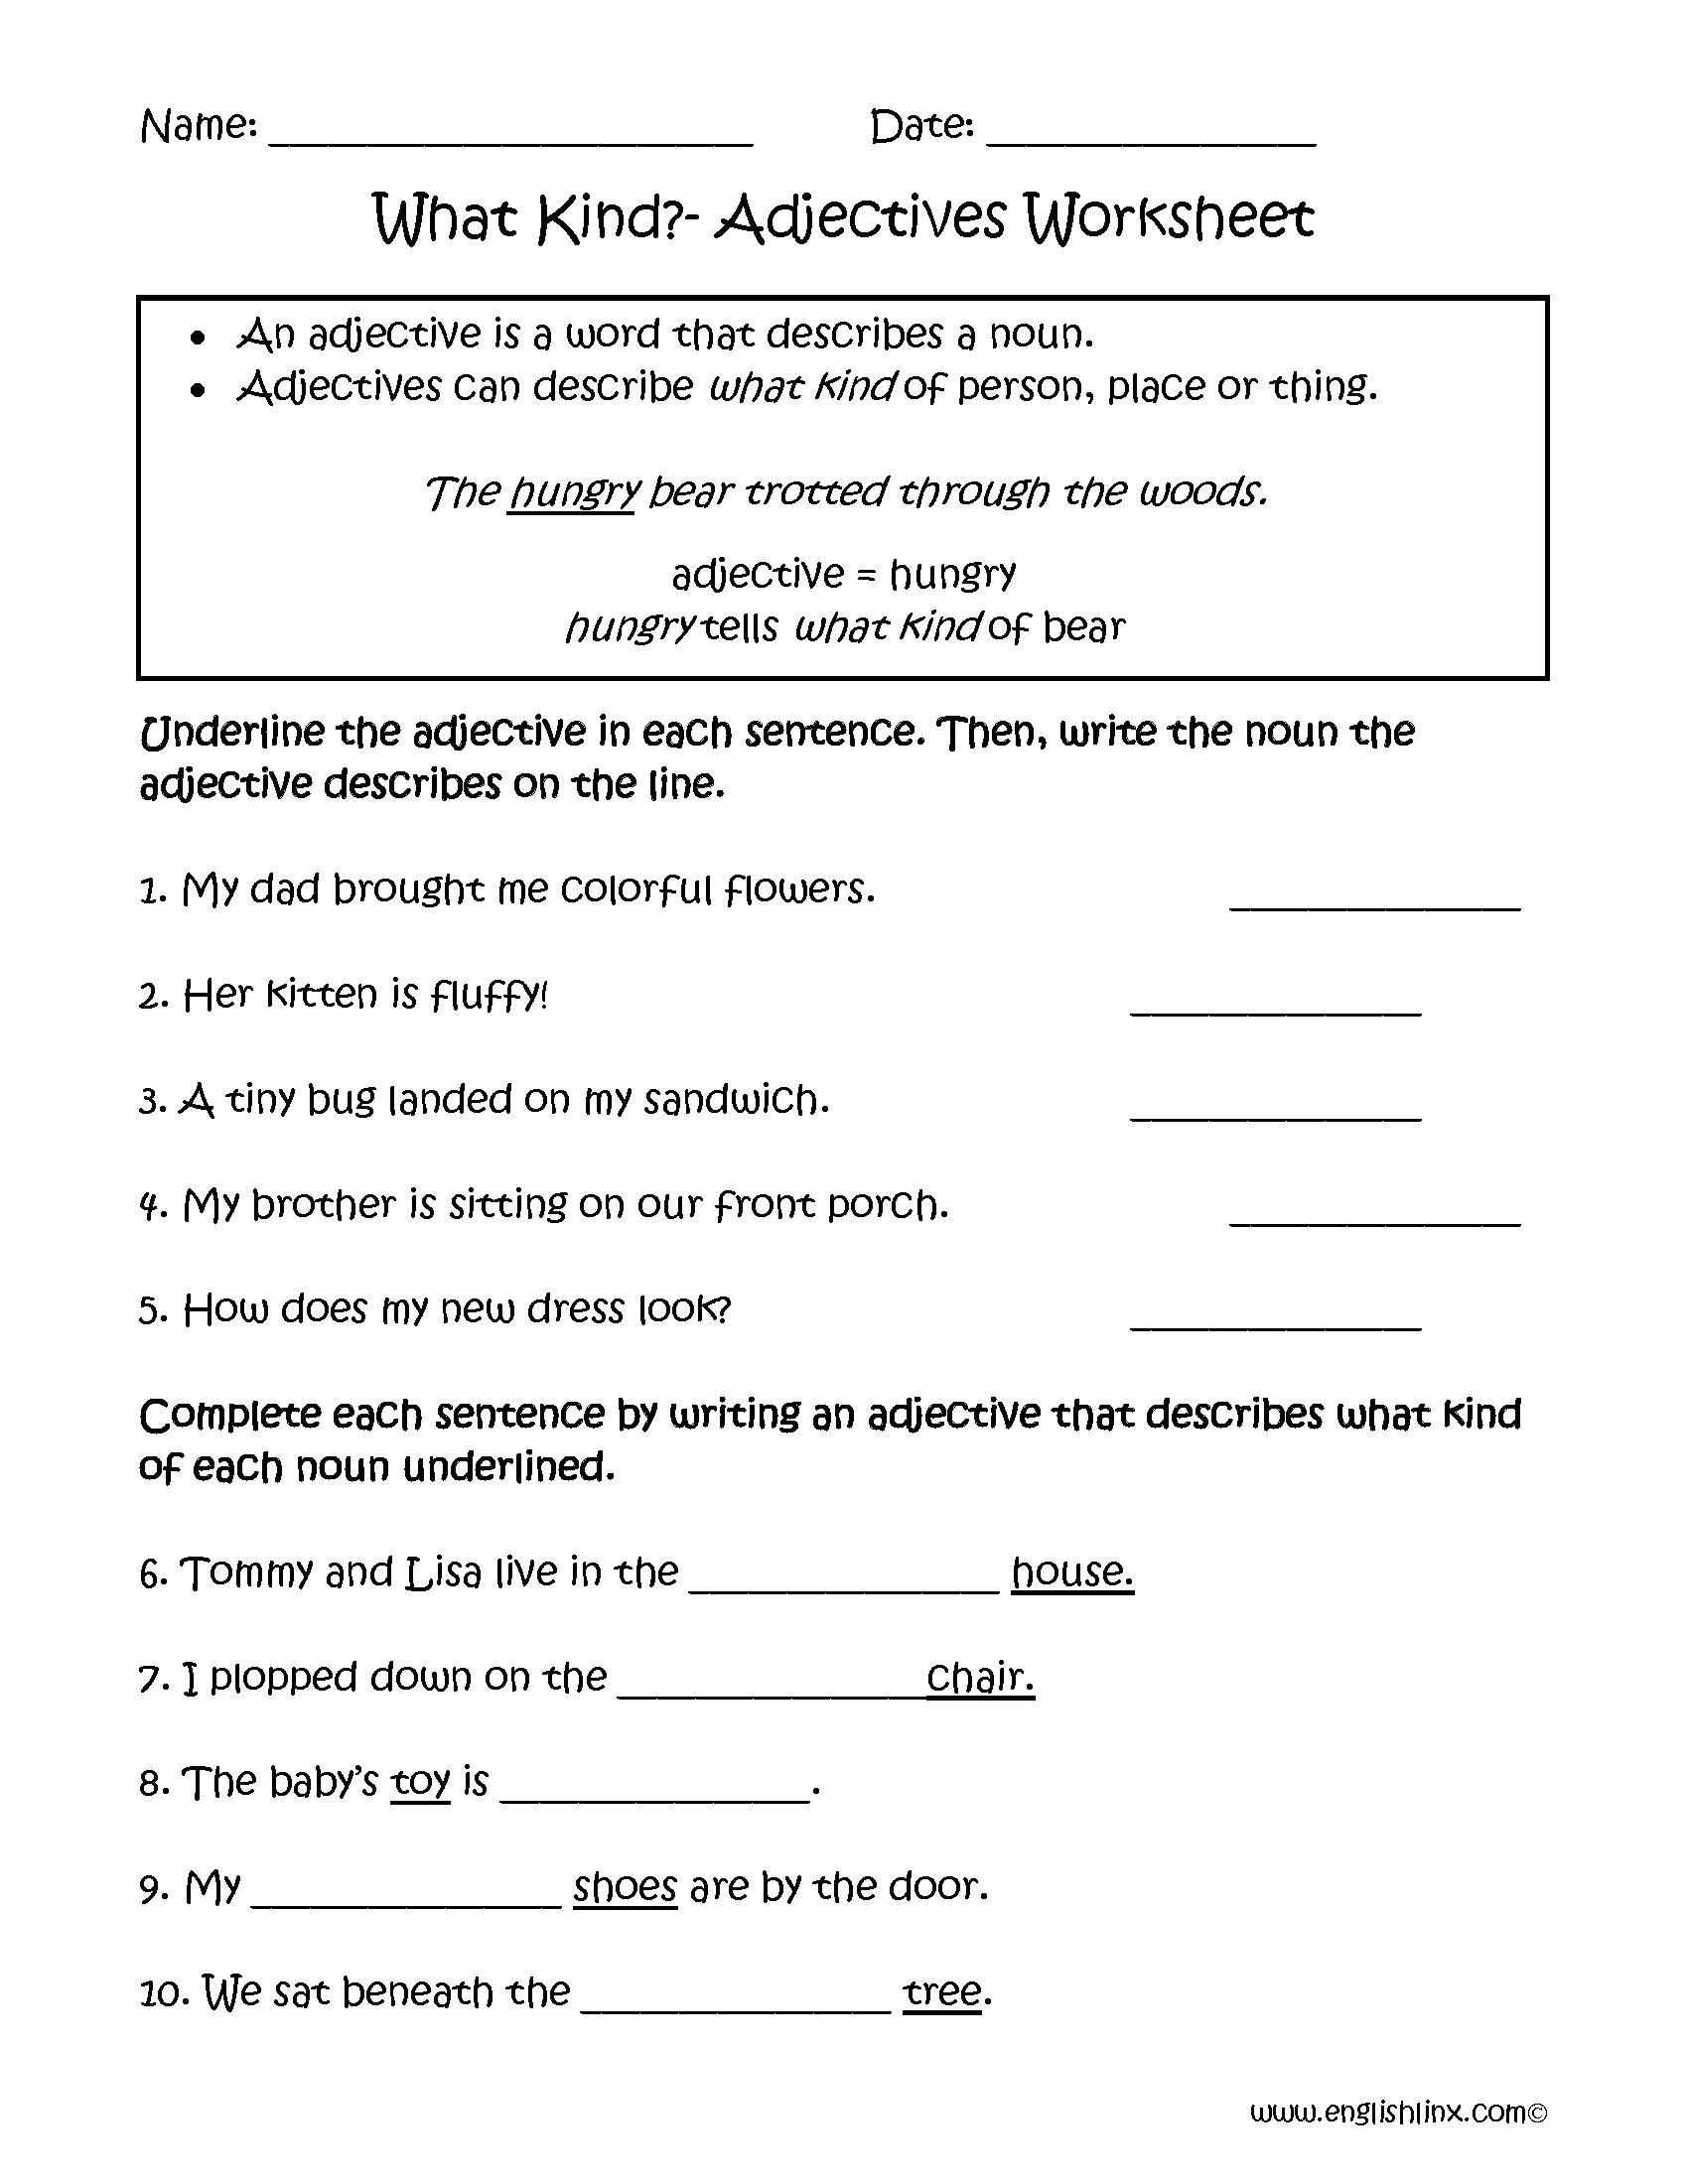 Adjectives Worksheets For Grade 4